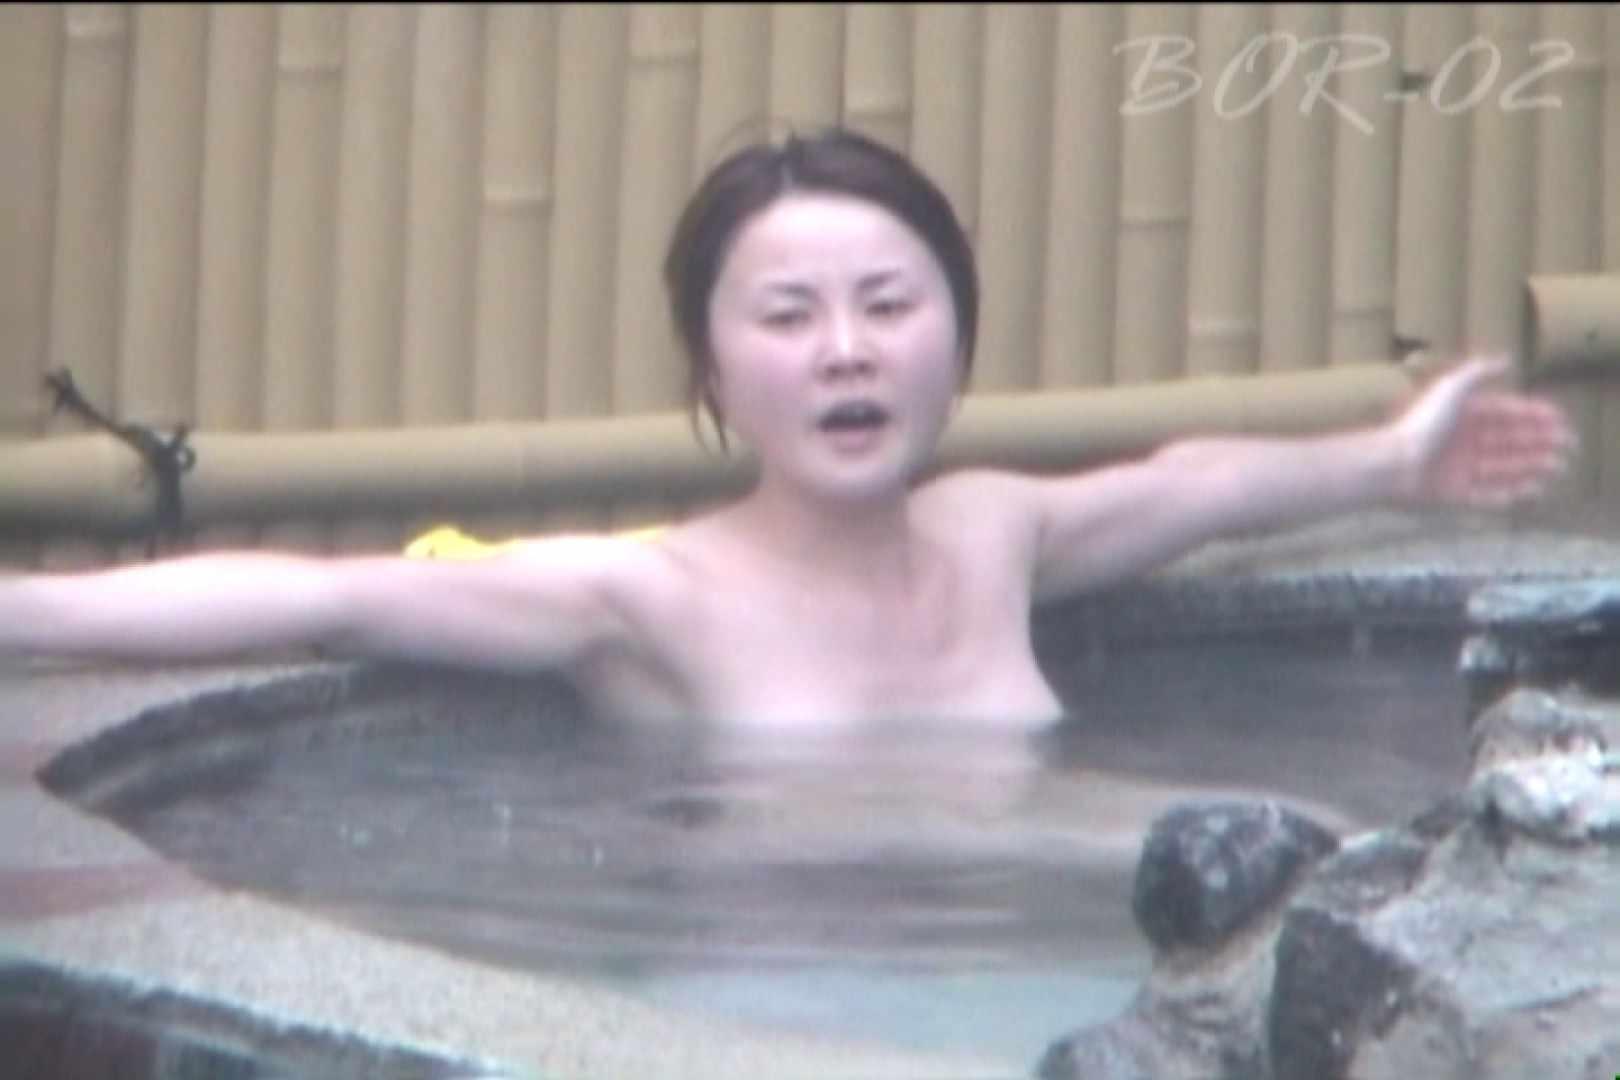 Aquaな露天風呂Vol.474 盗撮シリーズ | 露天風呂編  111PIX 99